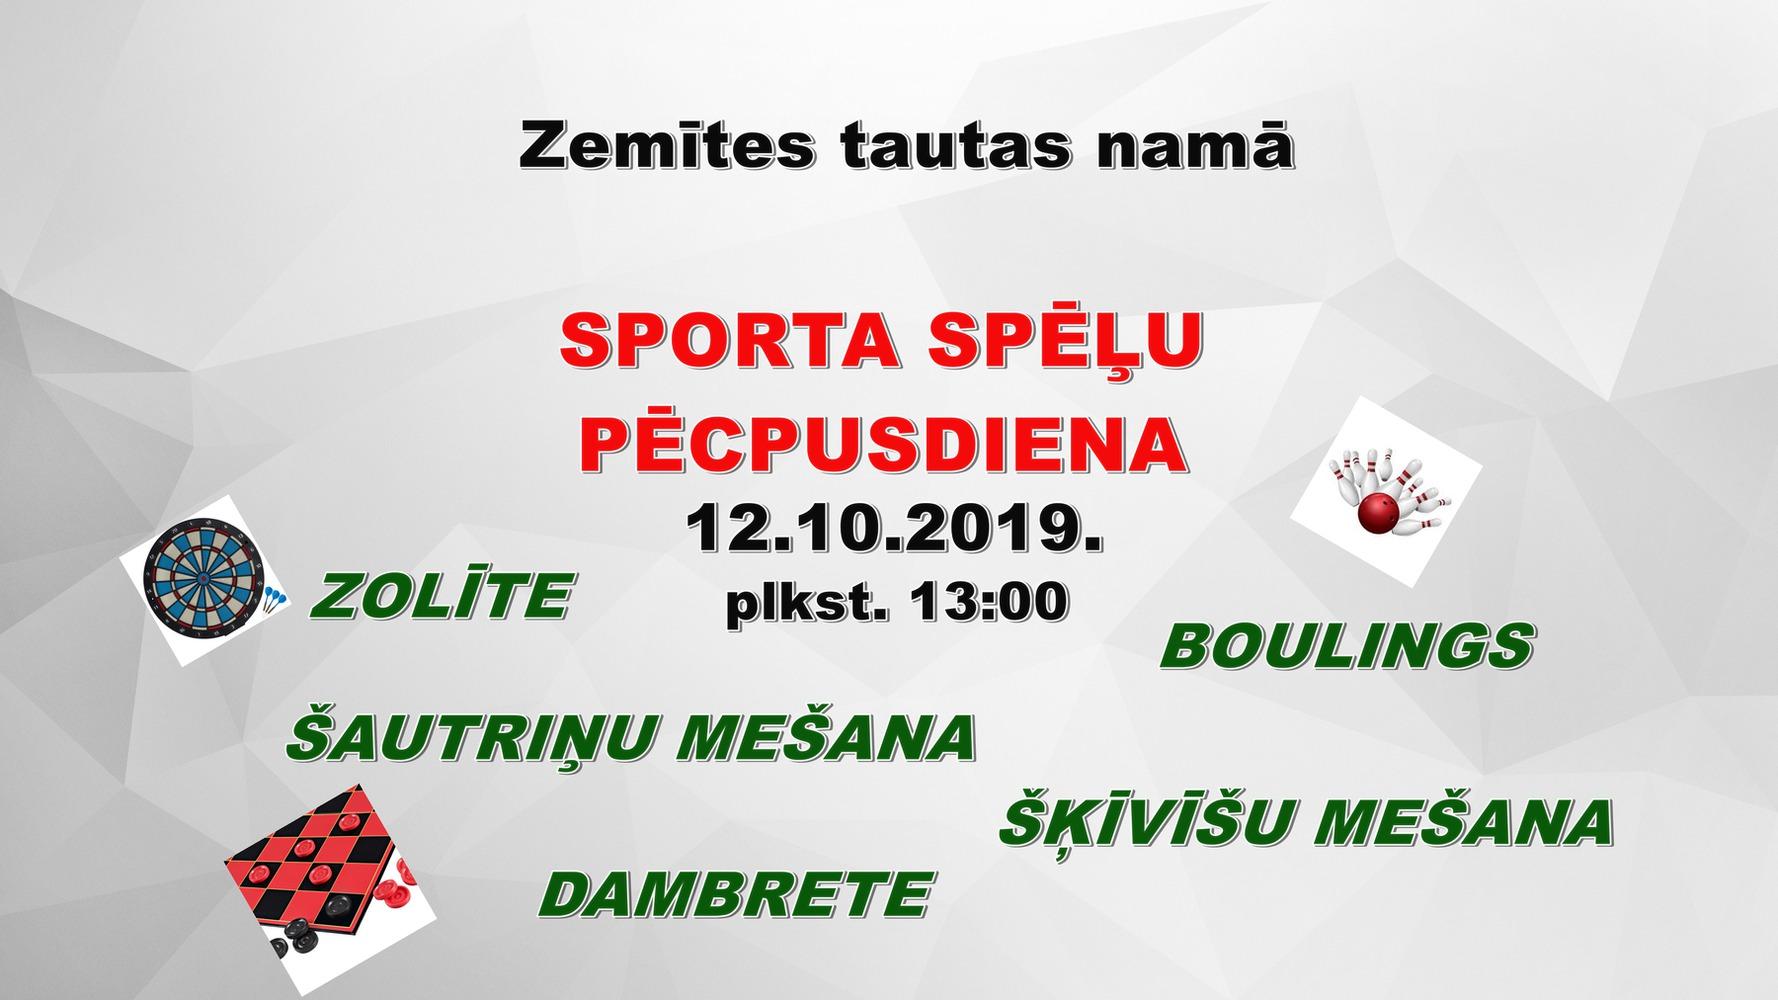 sporta_spelu_pecpusdiena_12_10.jpg